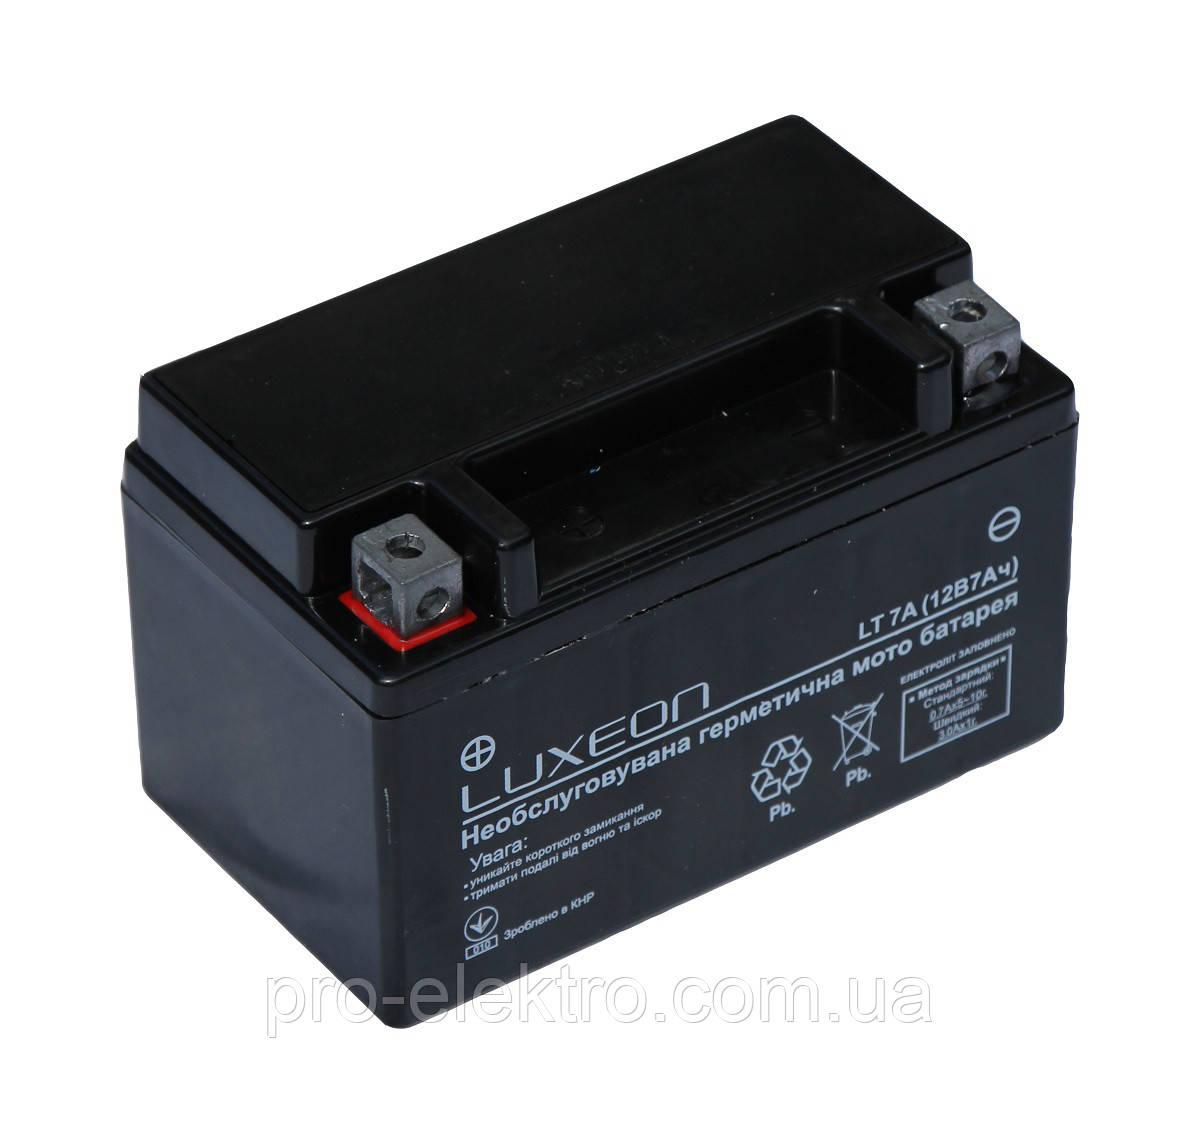 Аккумуляторная батарея LUXEON LT 7A